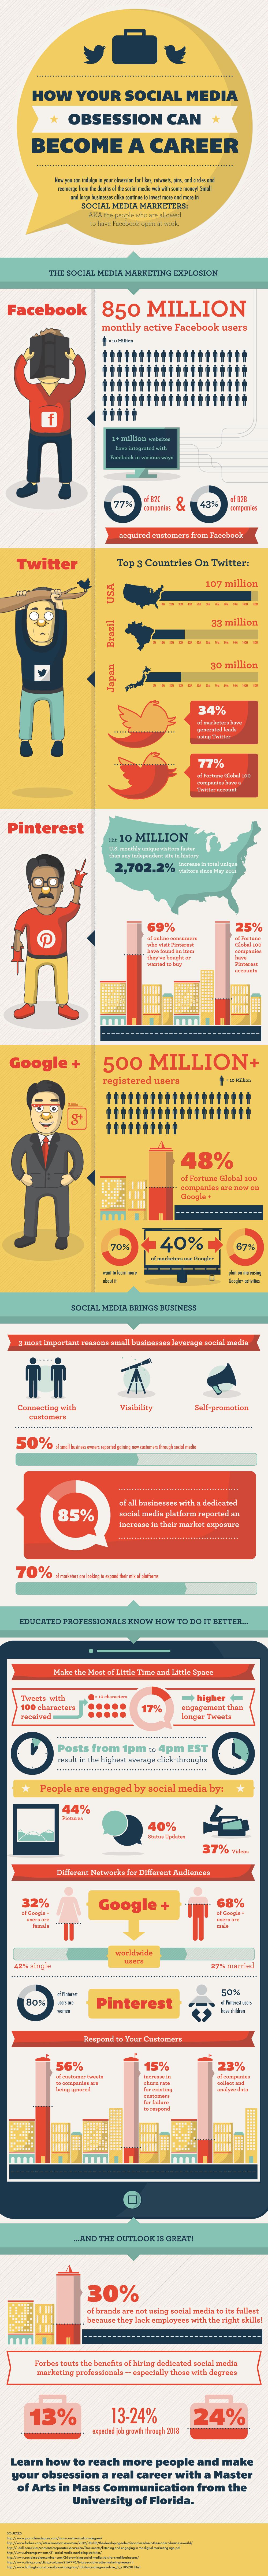 SocialMediaObsession